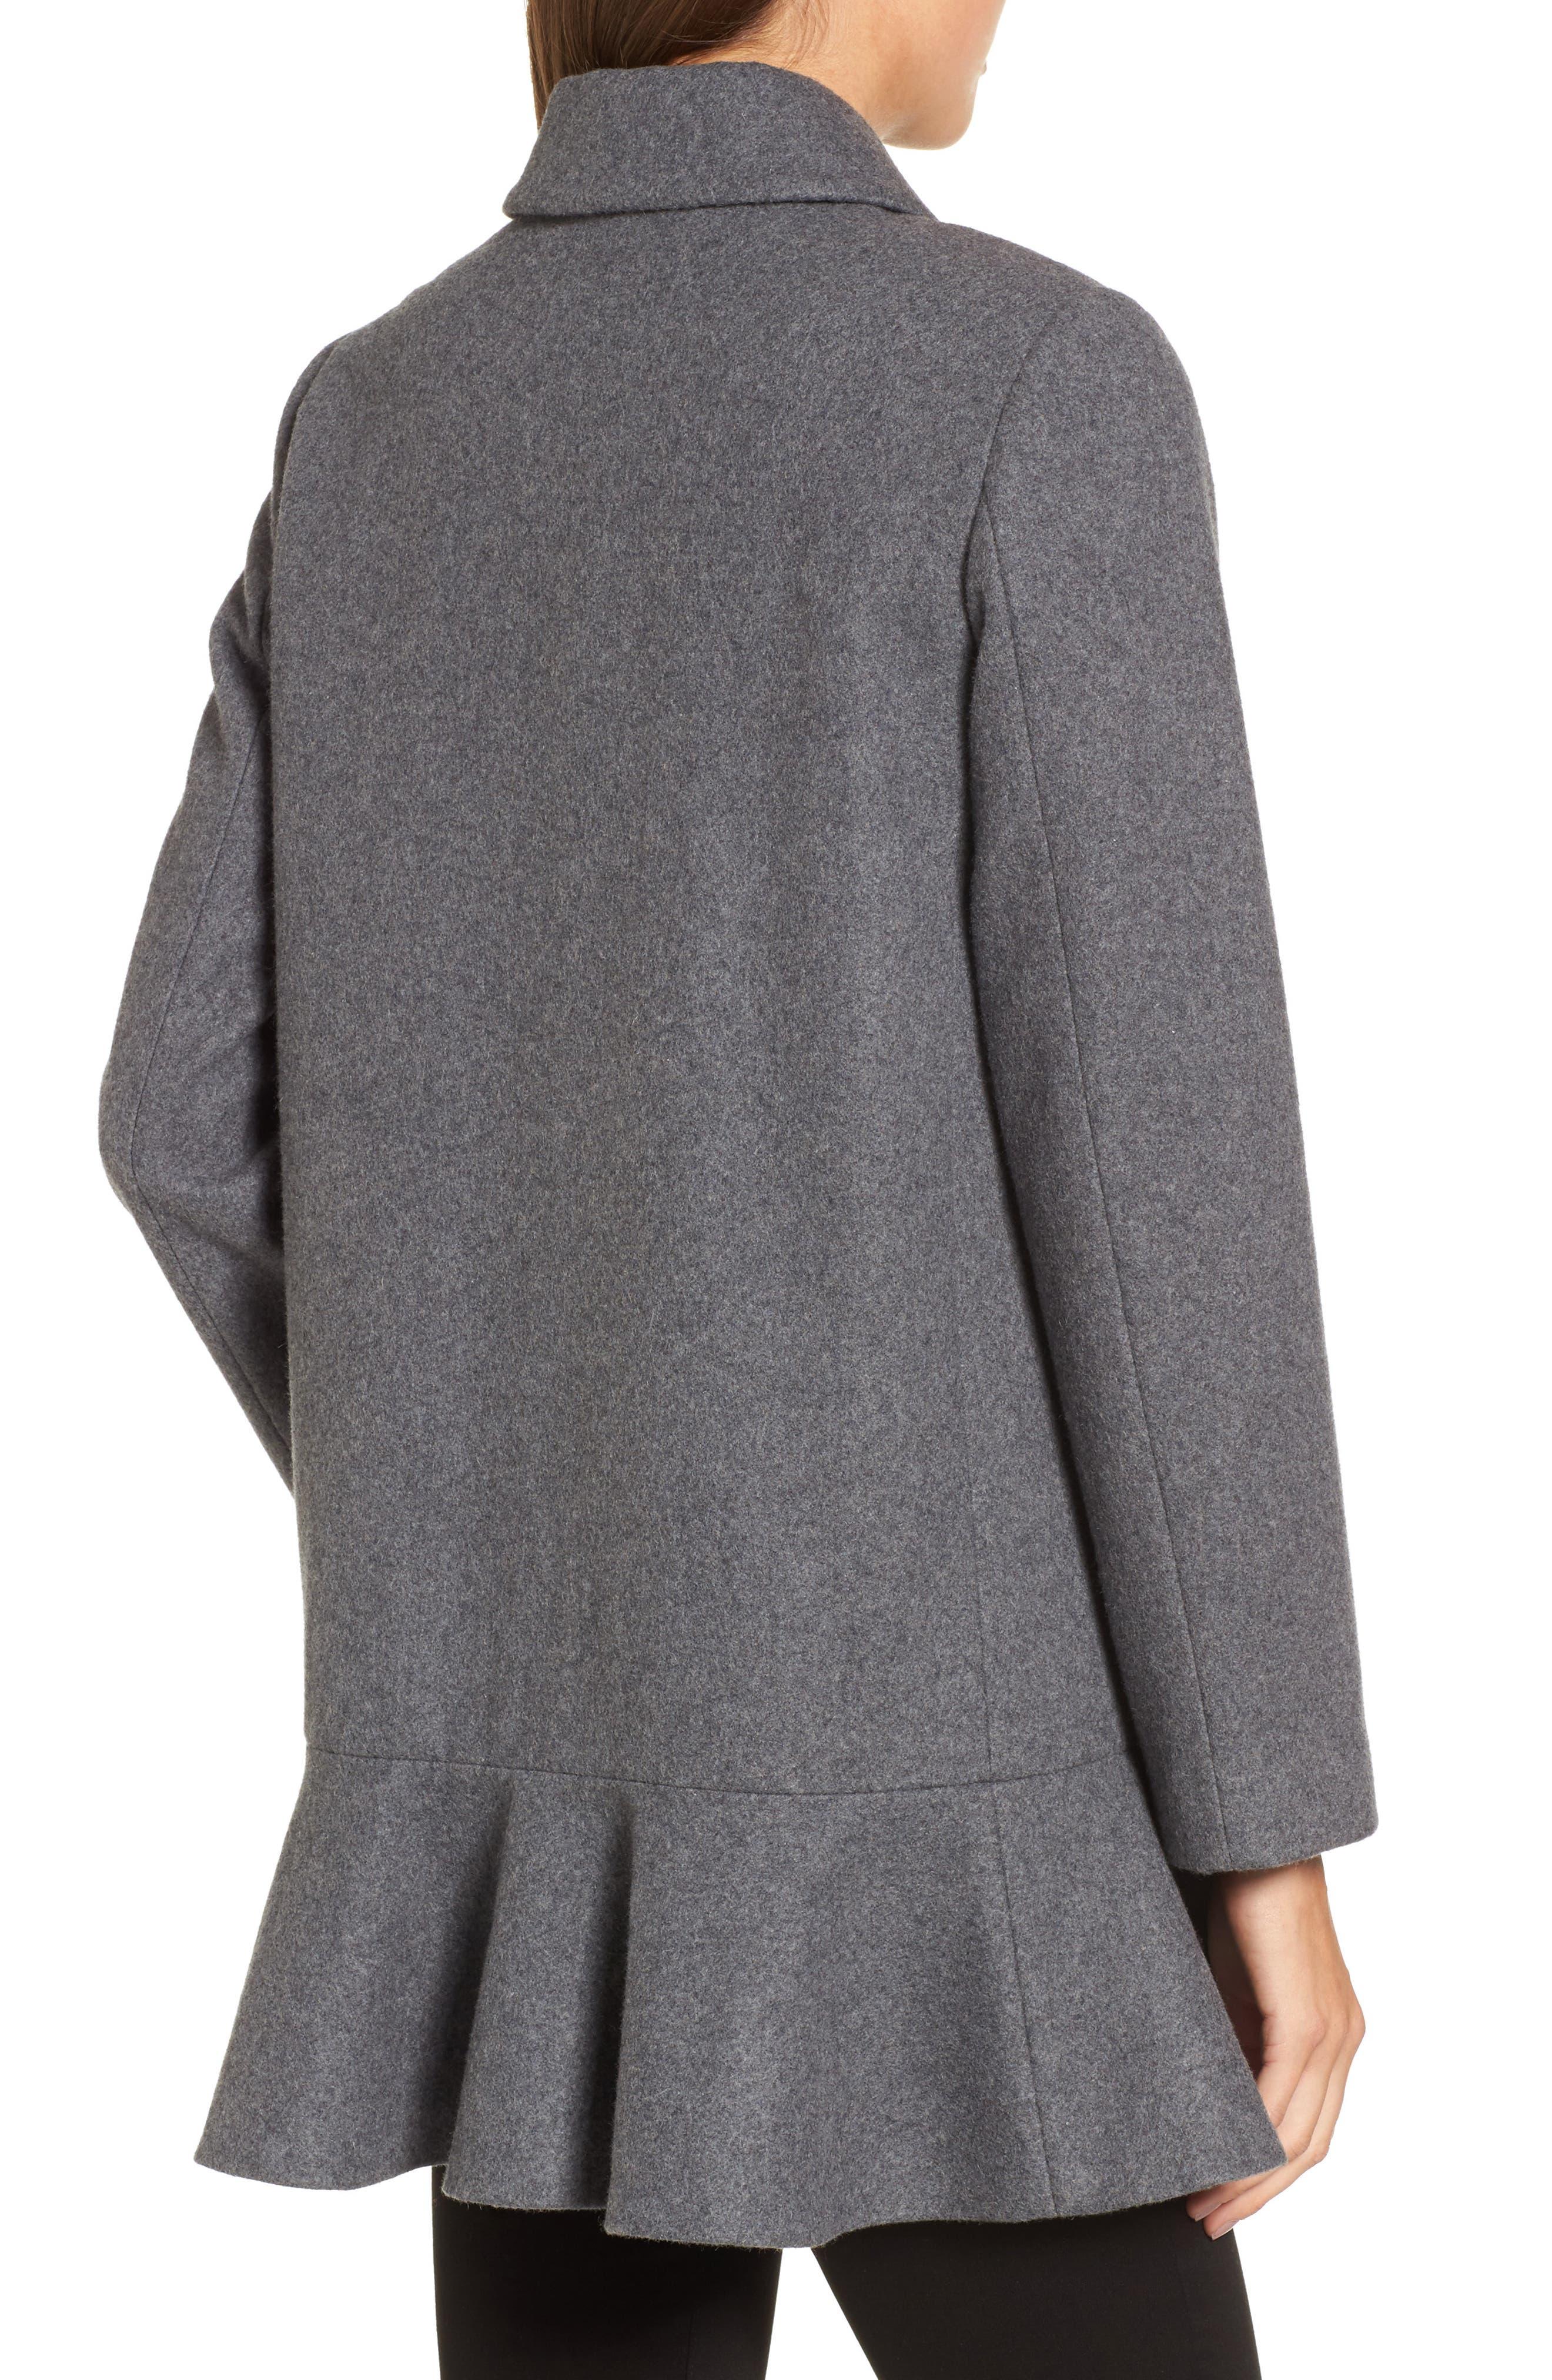 drop waist wool blend flounce coat,                             Alternate thumbnail 2, color,                             Soft Grey/ Light Grey